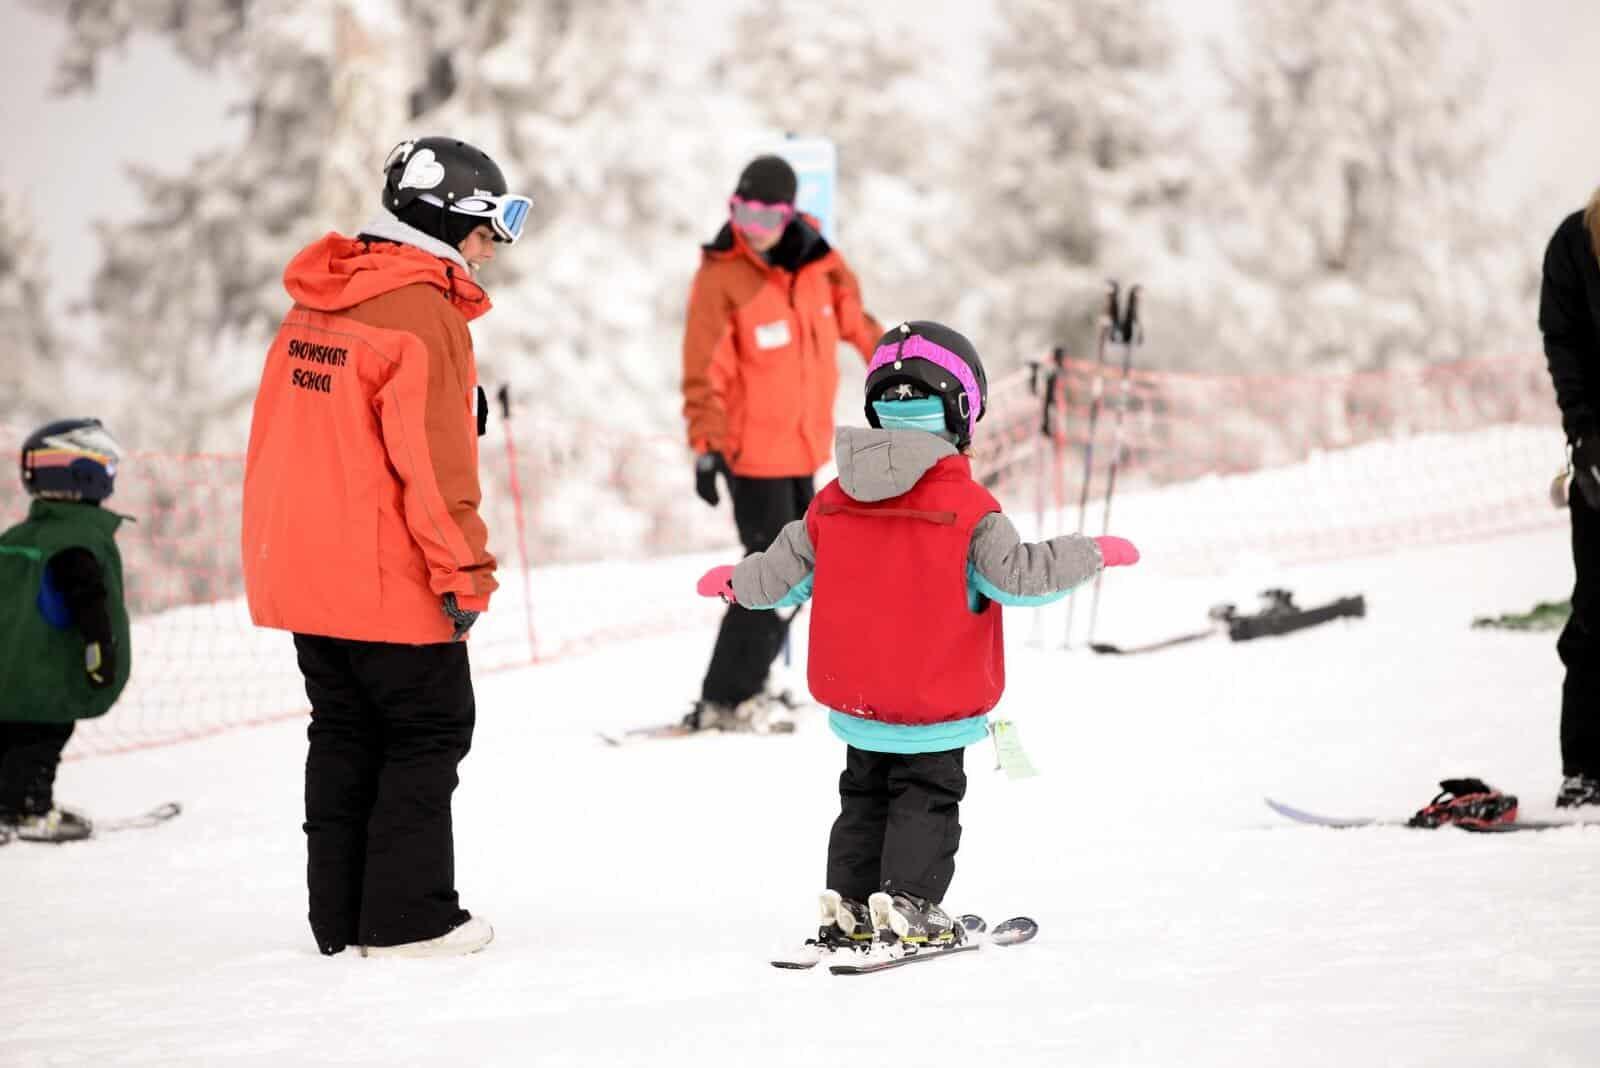 Mt. Ashland Ski School Instructors And Student